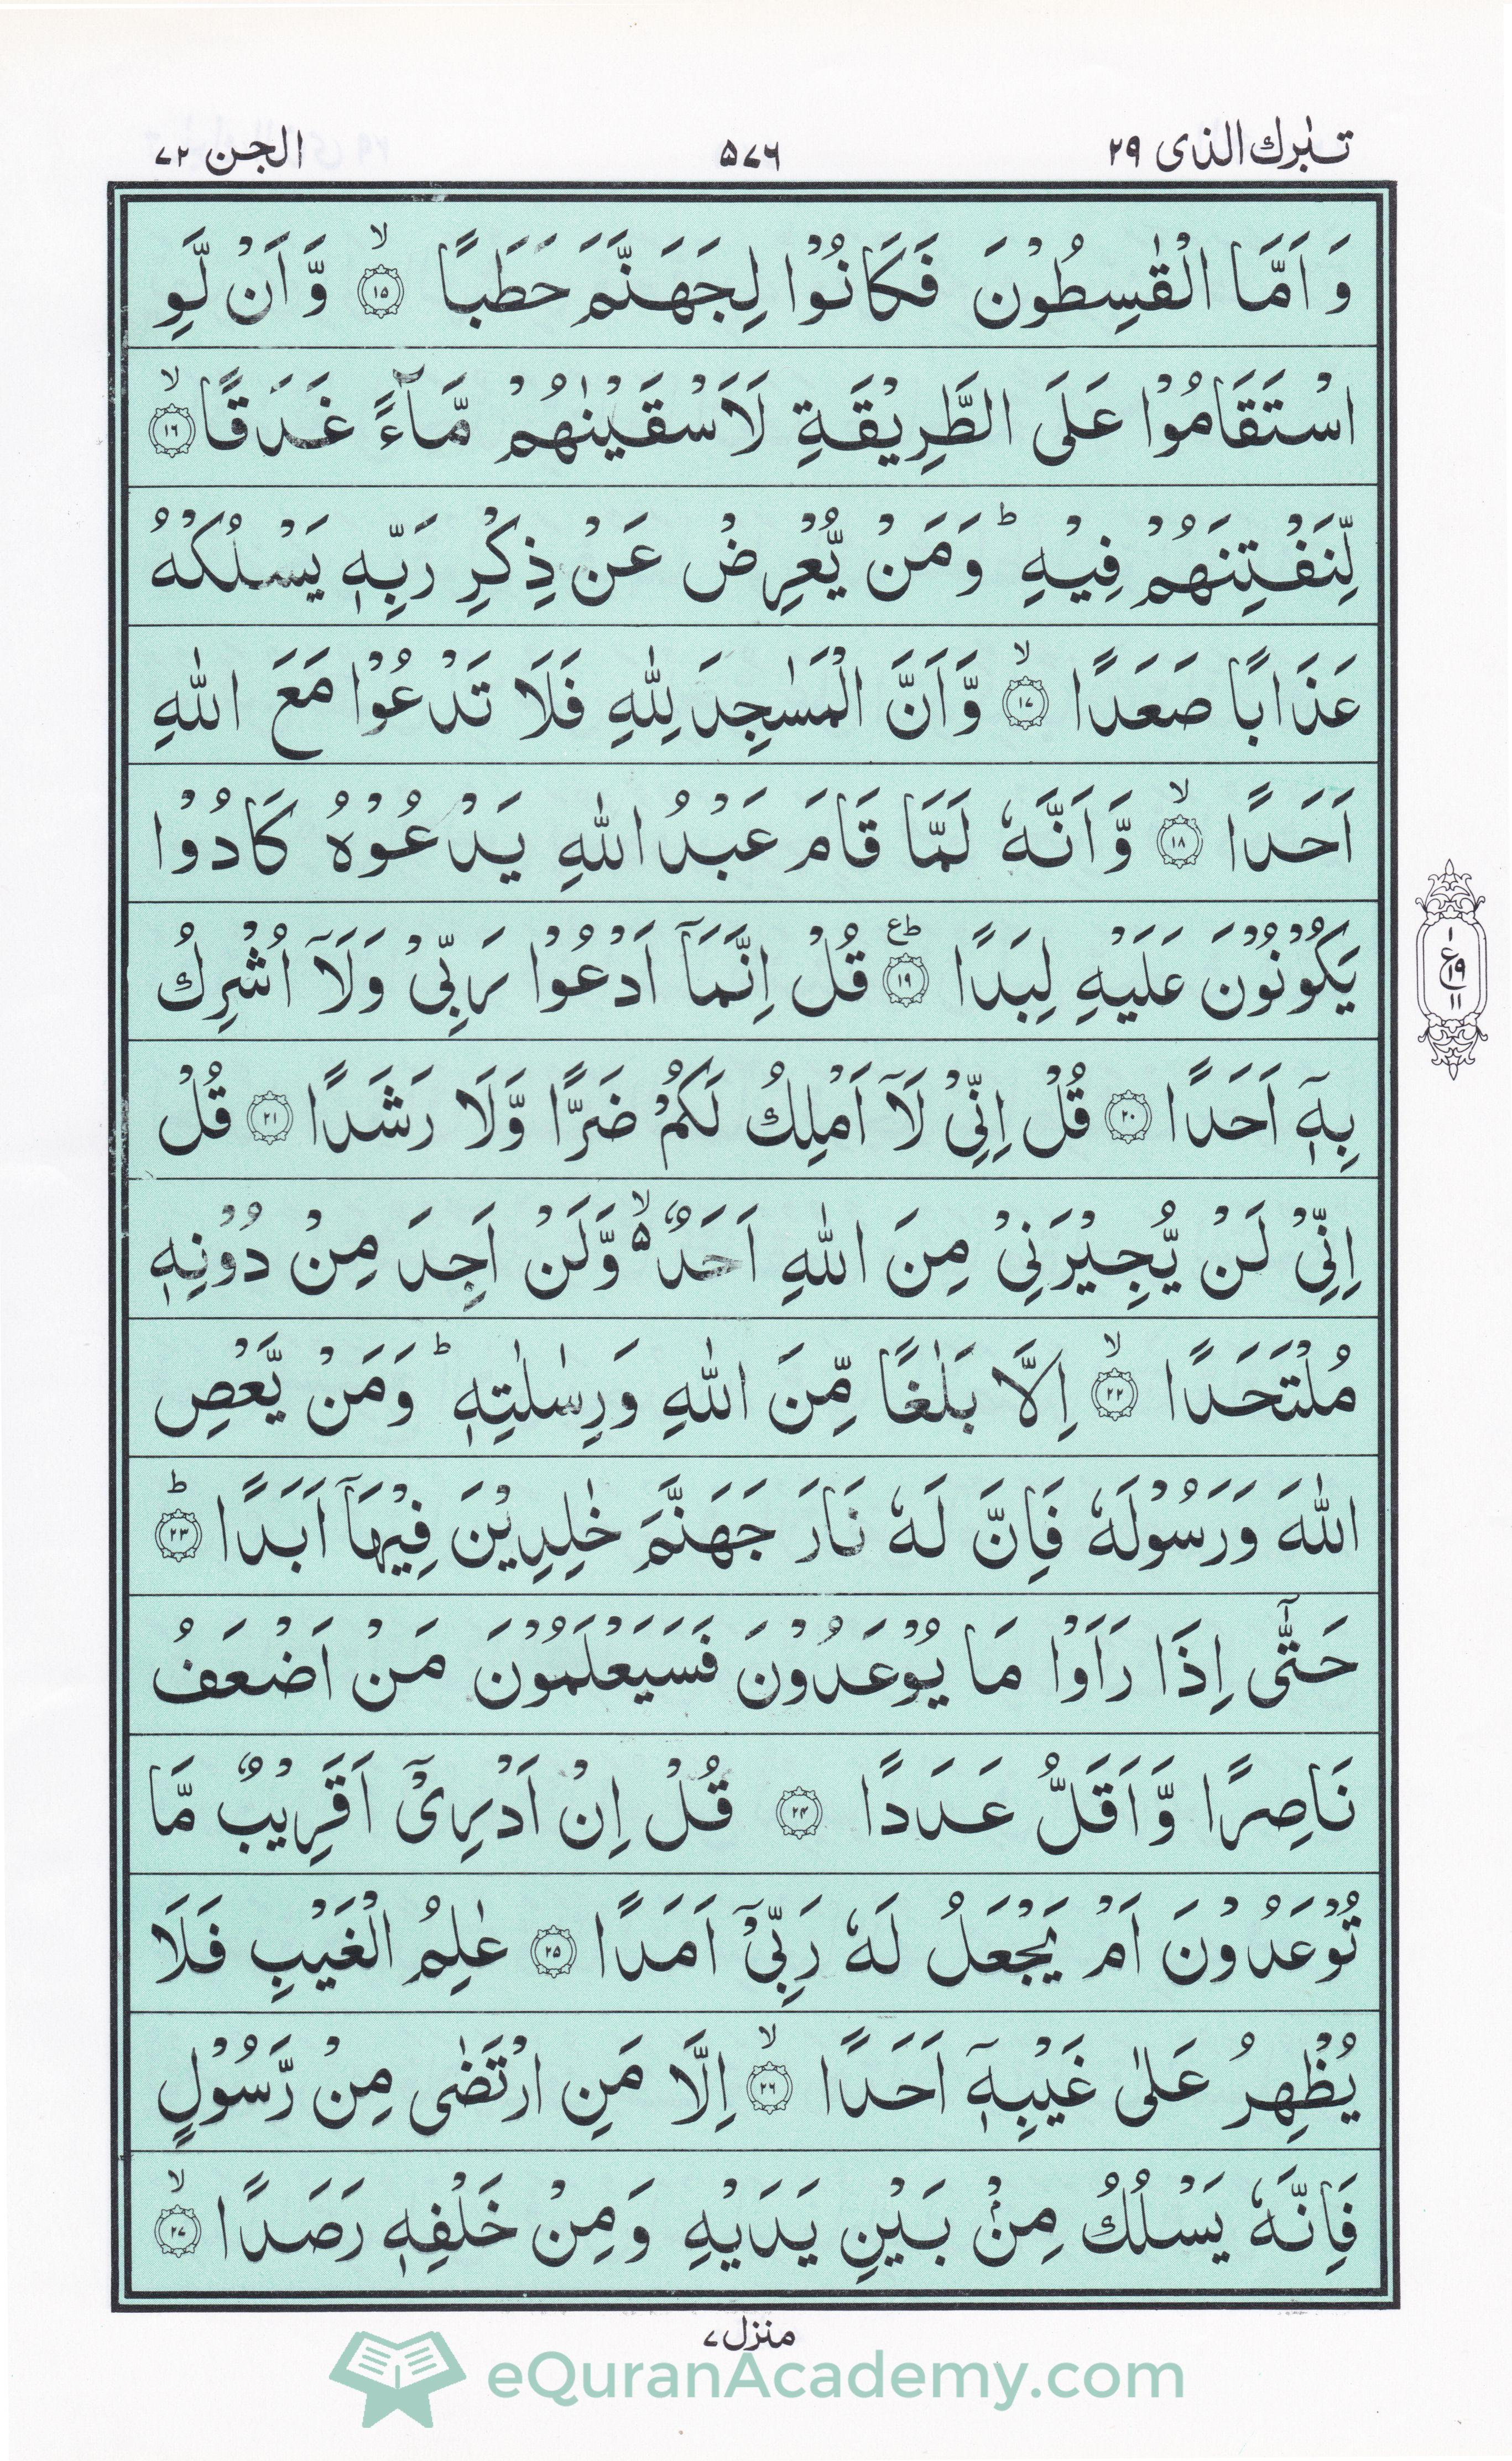 Quran Para 29 Page 14 Tabarakallazi ت ب ار ك ال ذ ي Quran Juz 29 Page 14 Quran Recitation Online Quran Learn Quran